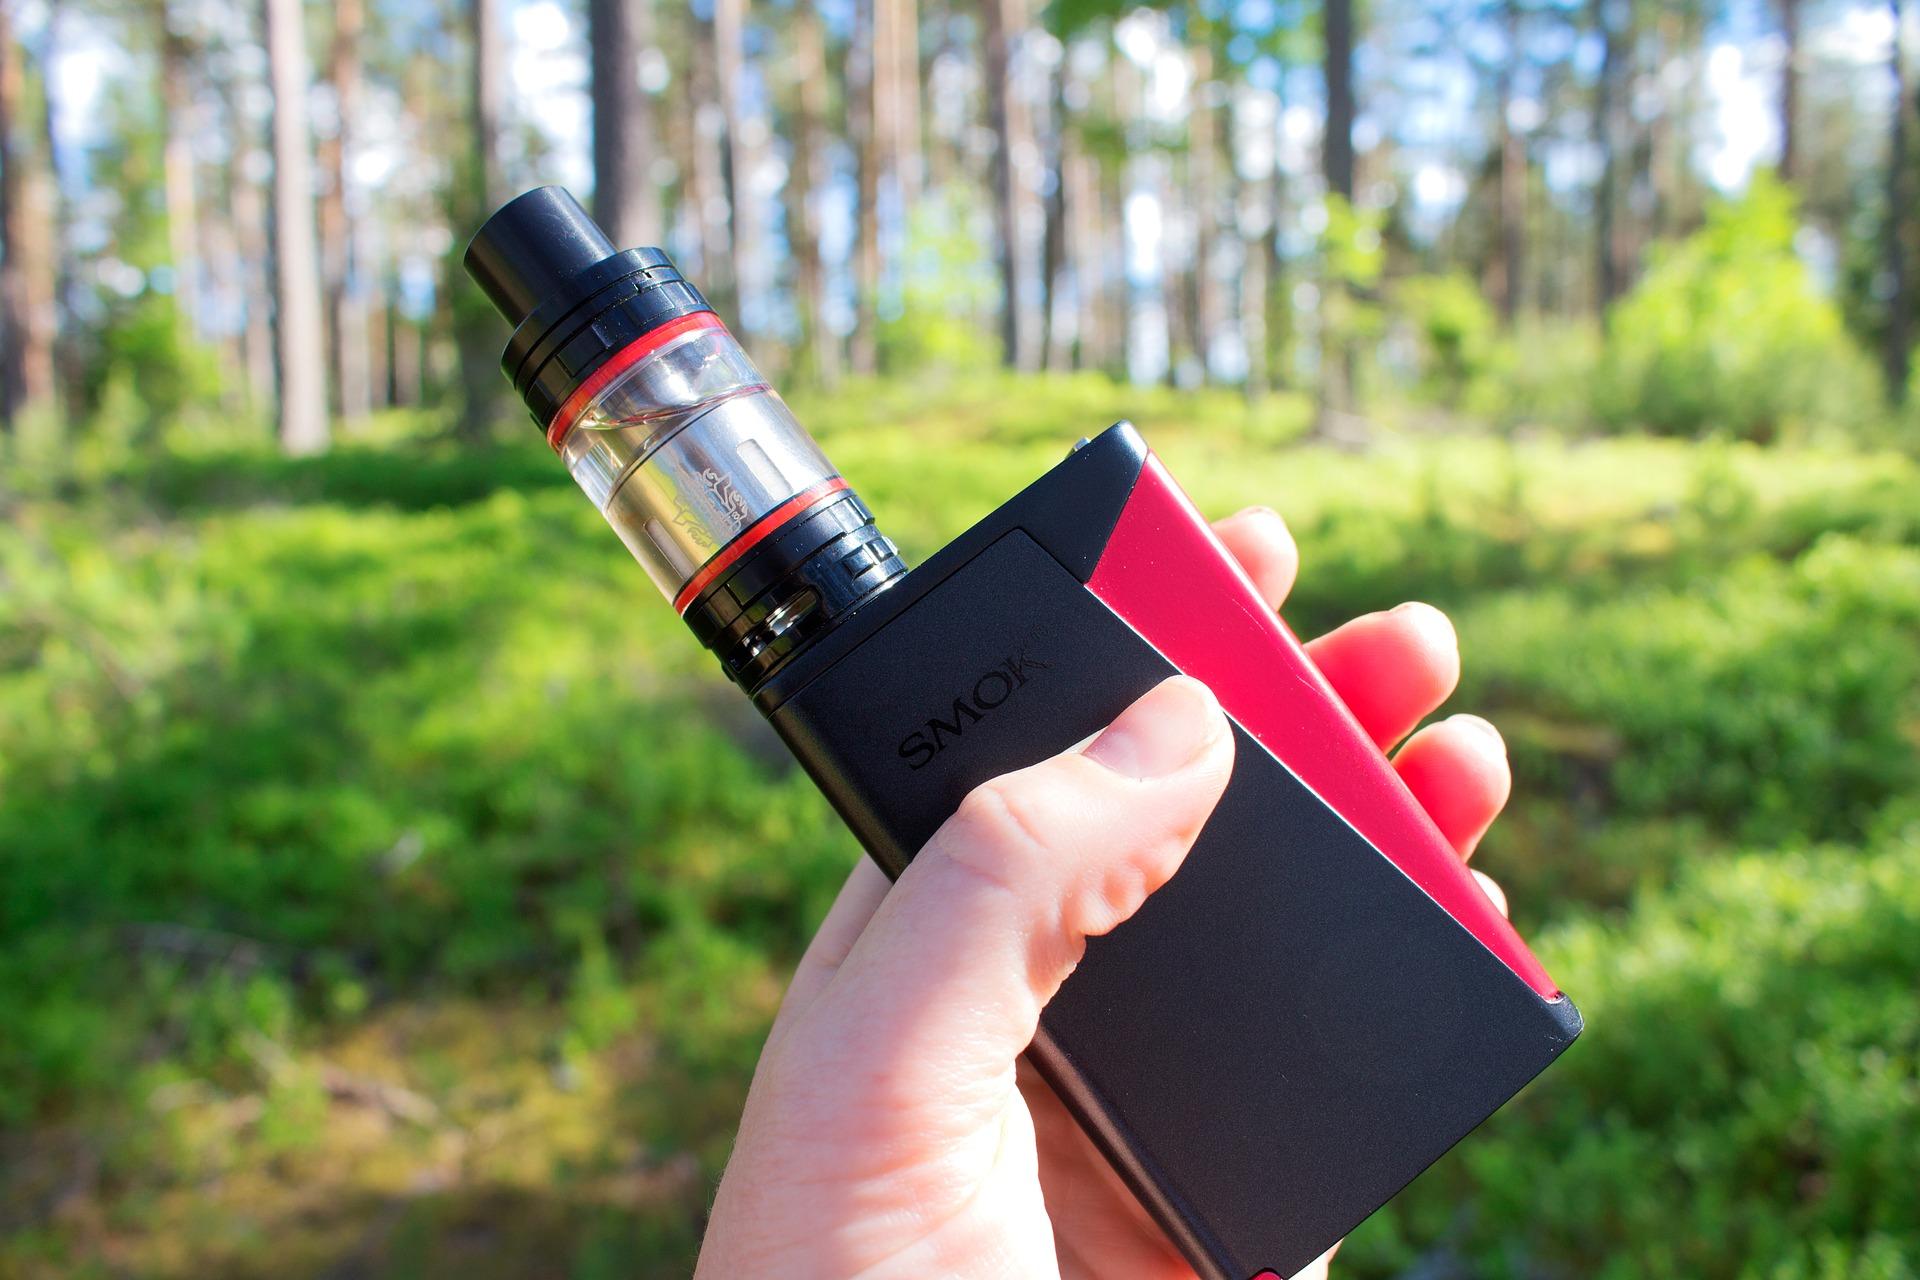 продажа одноразовых электронных сигарет закон